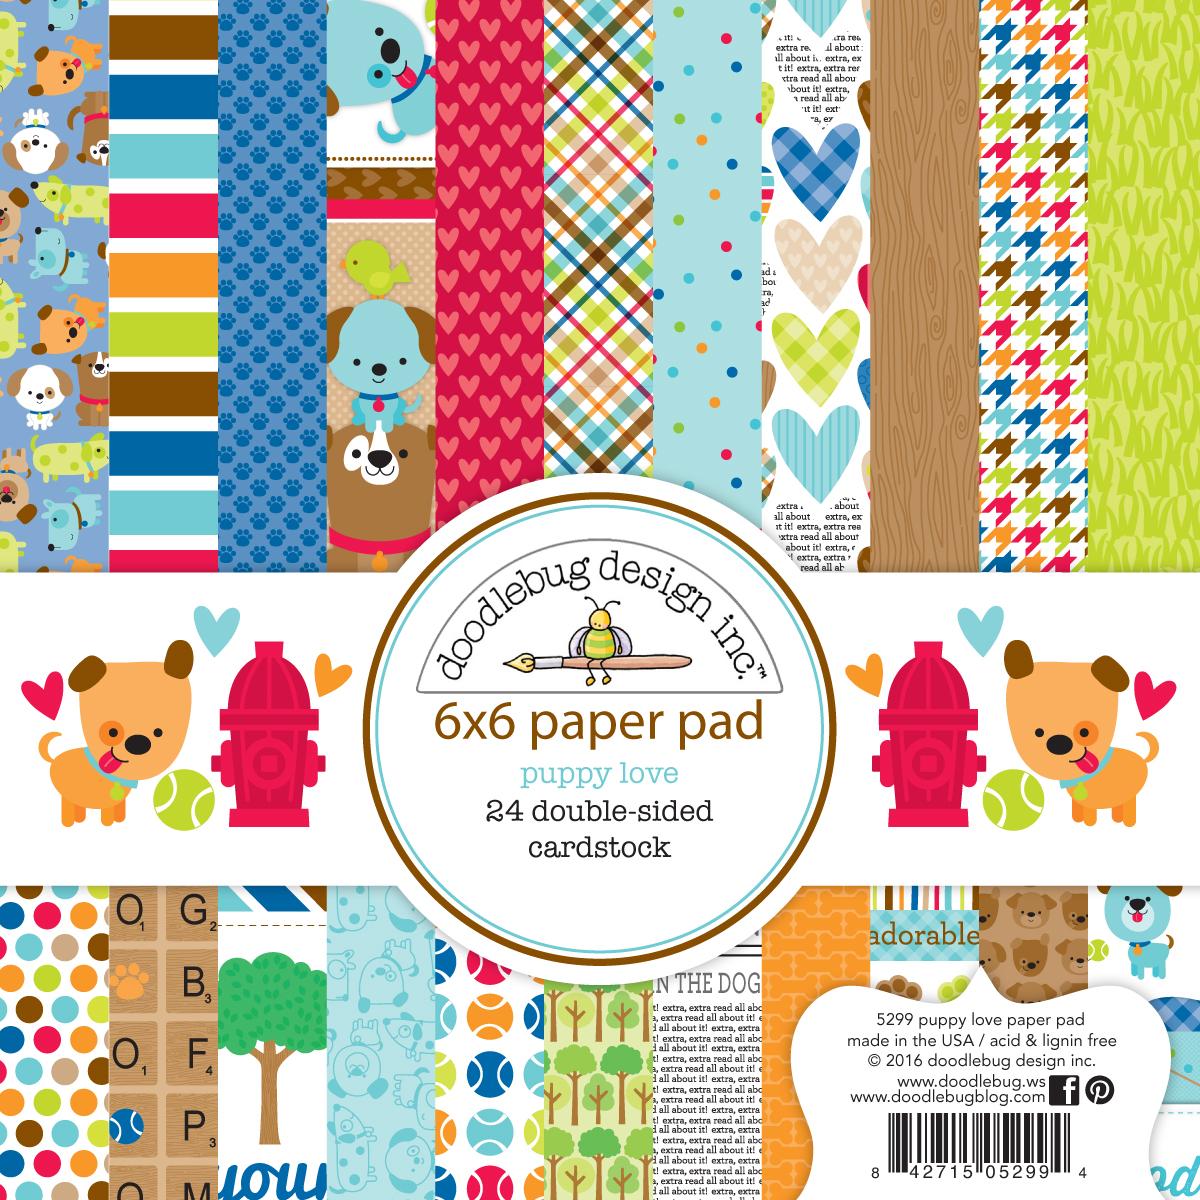 Scrapbook paper dogs - Doodlebug Design Inc Blog Spring 2016 Sneak Peek Puppy Love Collection